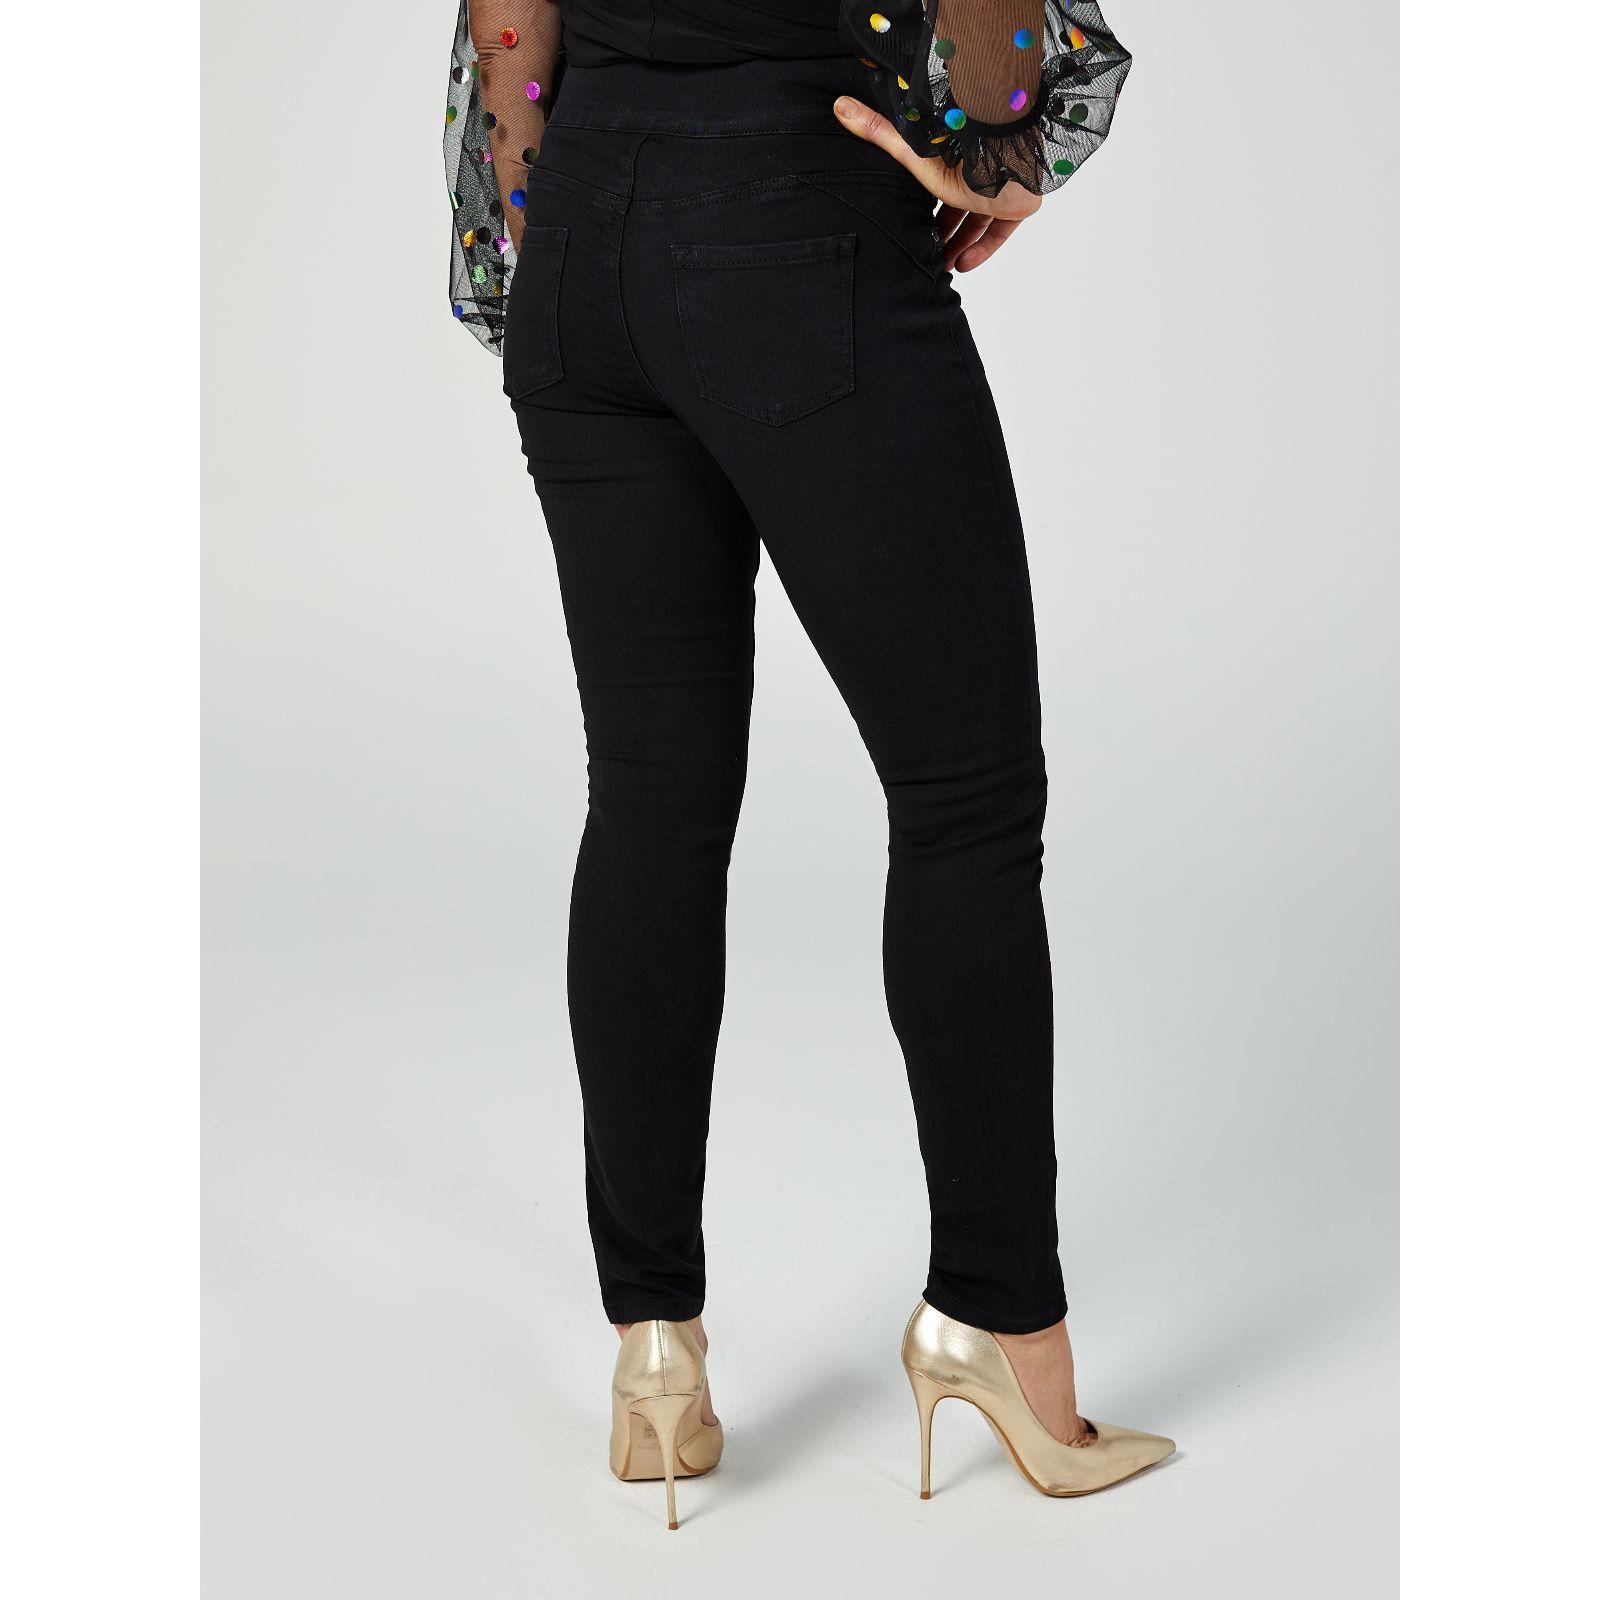 0d16d35fe20 Diane Gilman Skinny Pull On Jeans - QVC UK